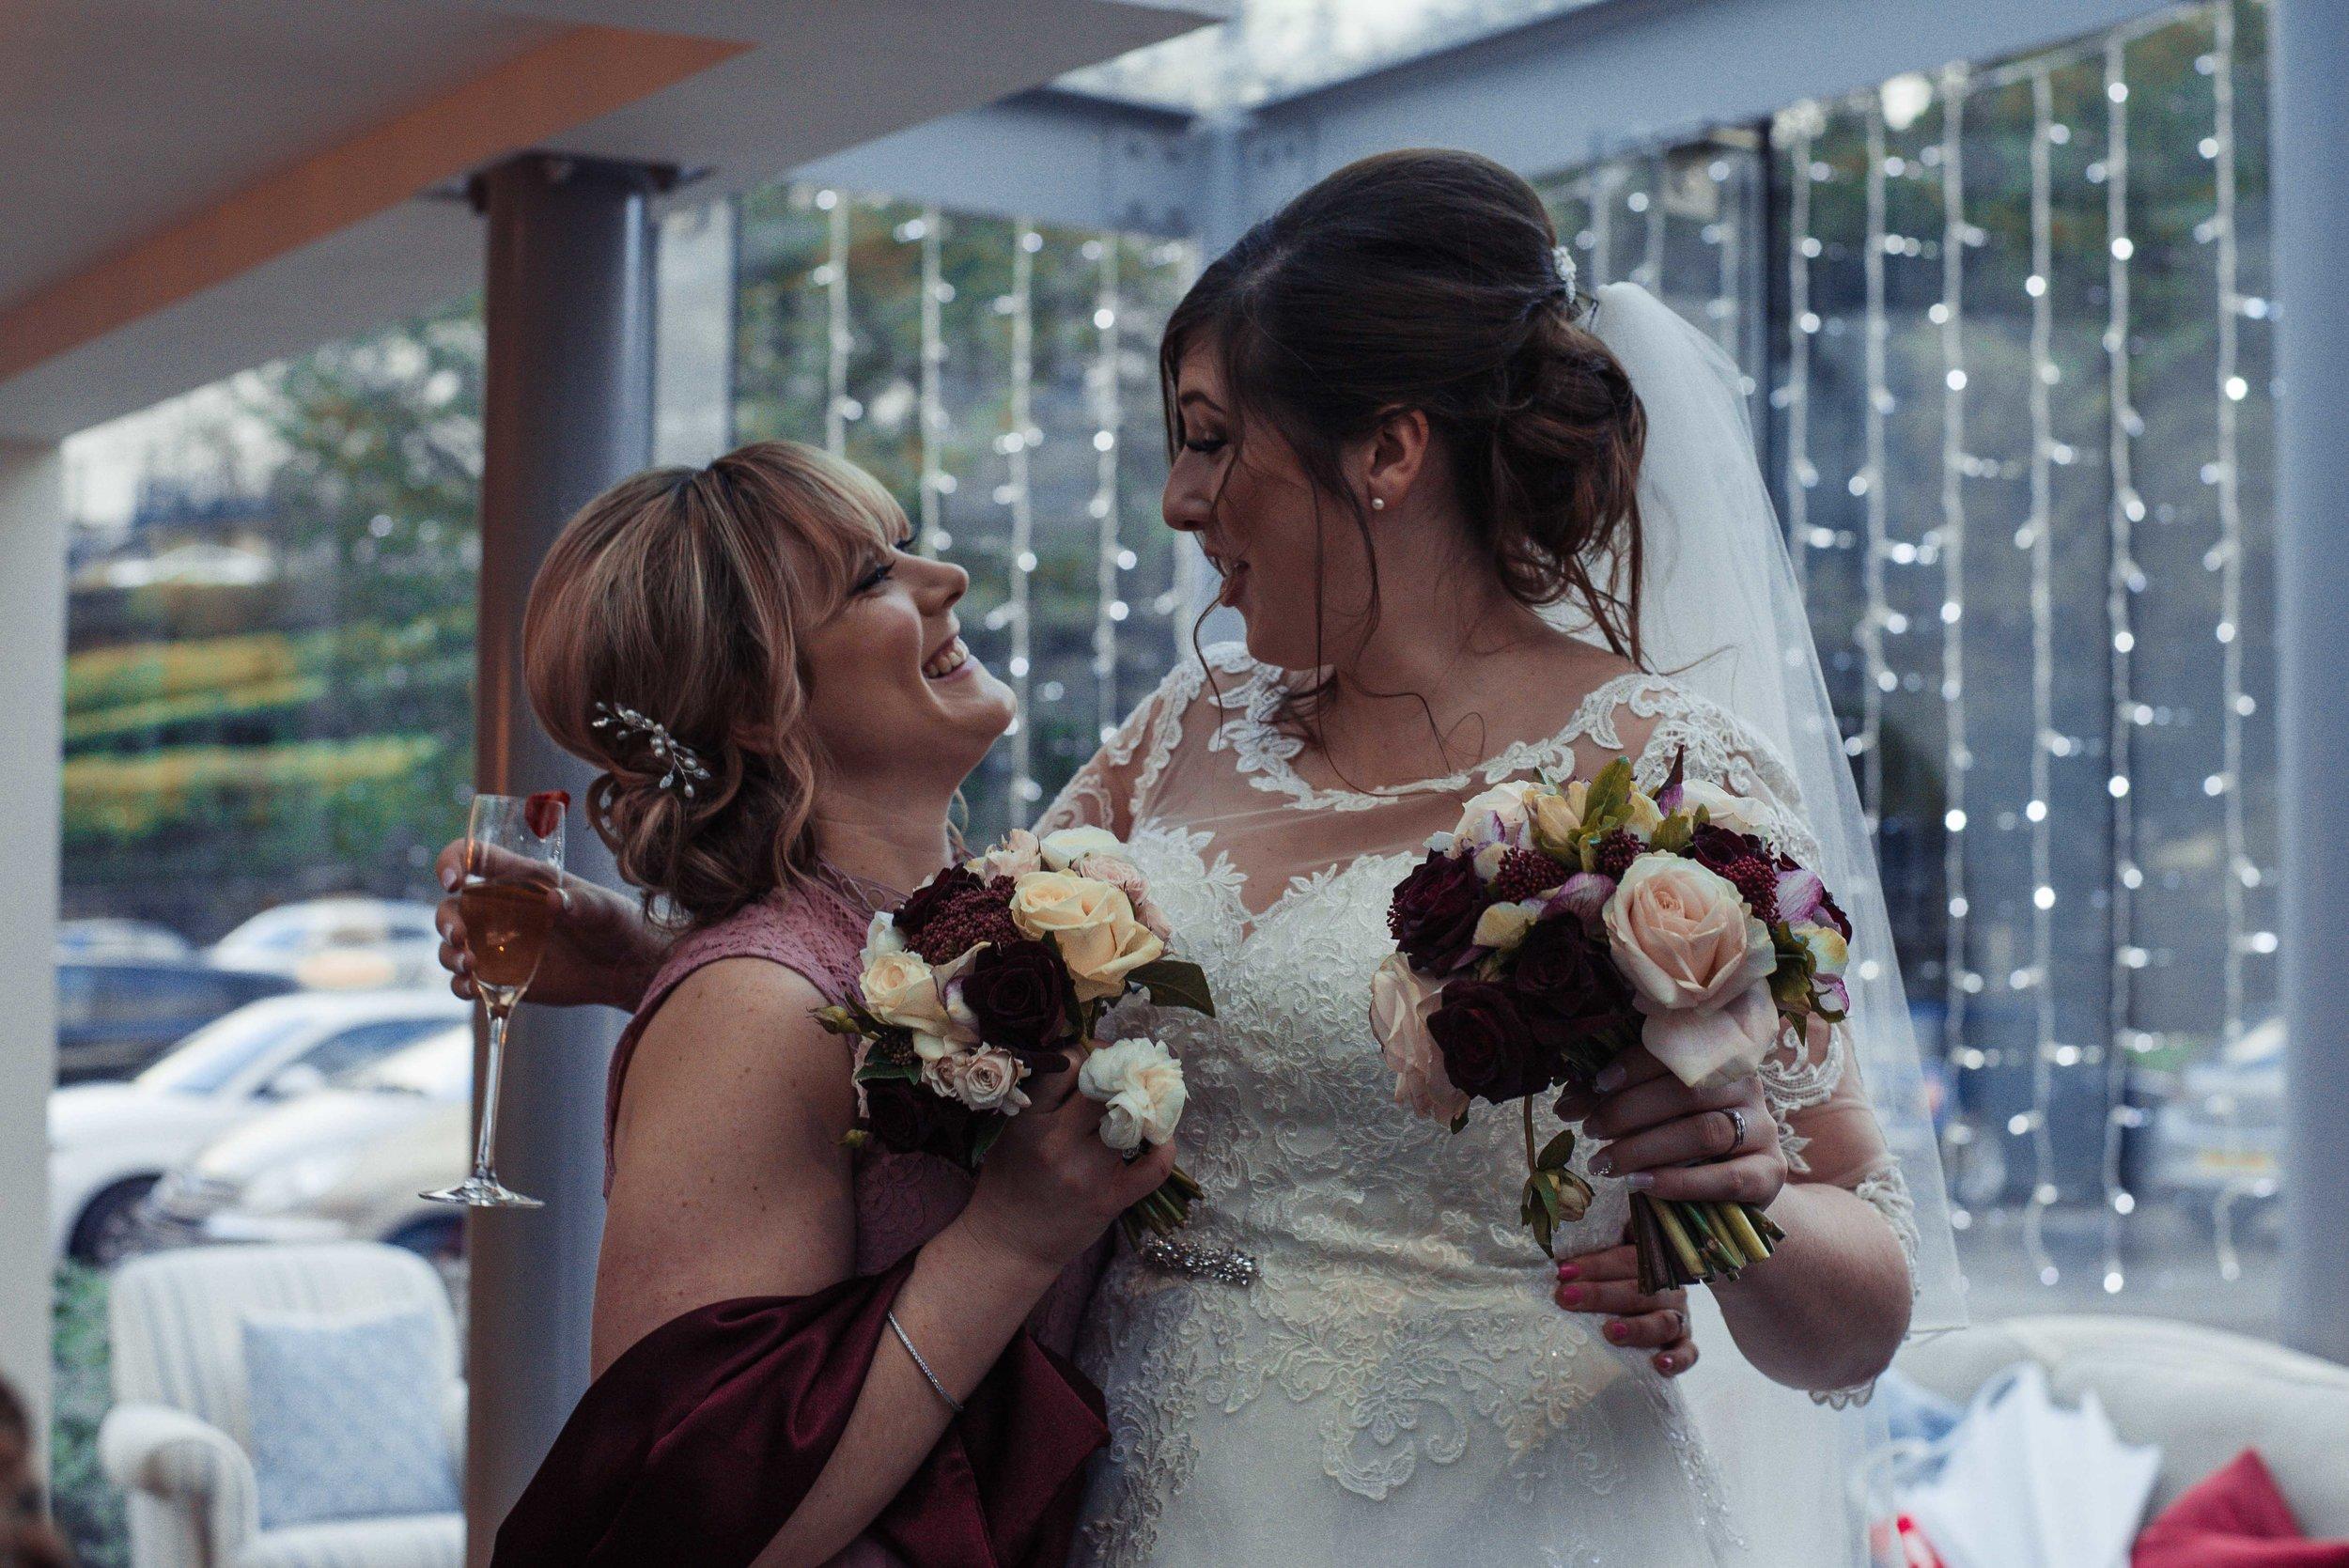 Belsfield-wedding-photography-25.jpg